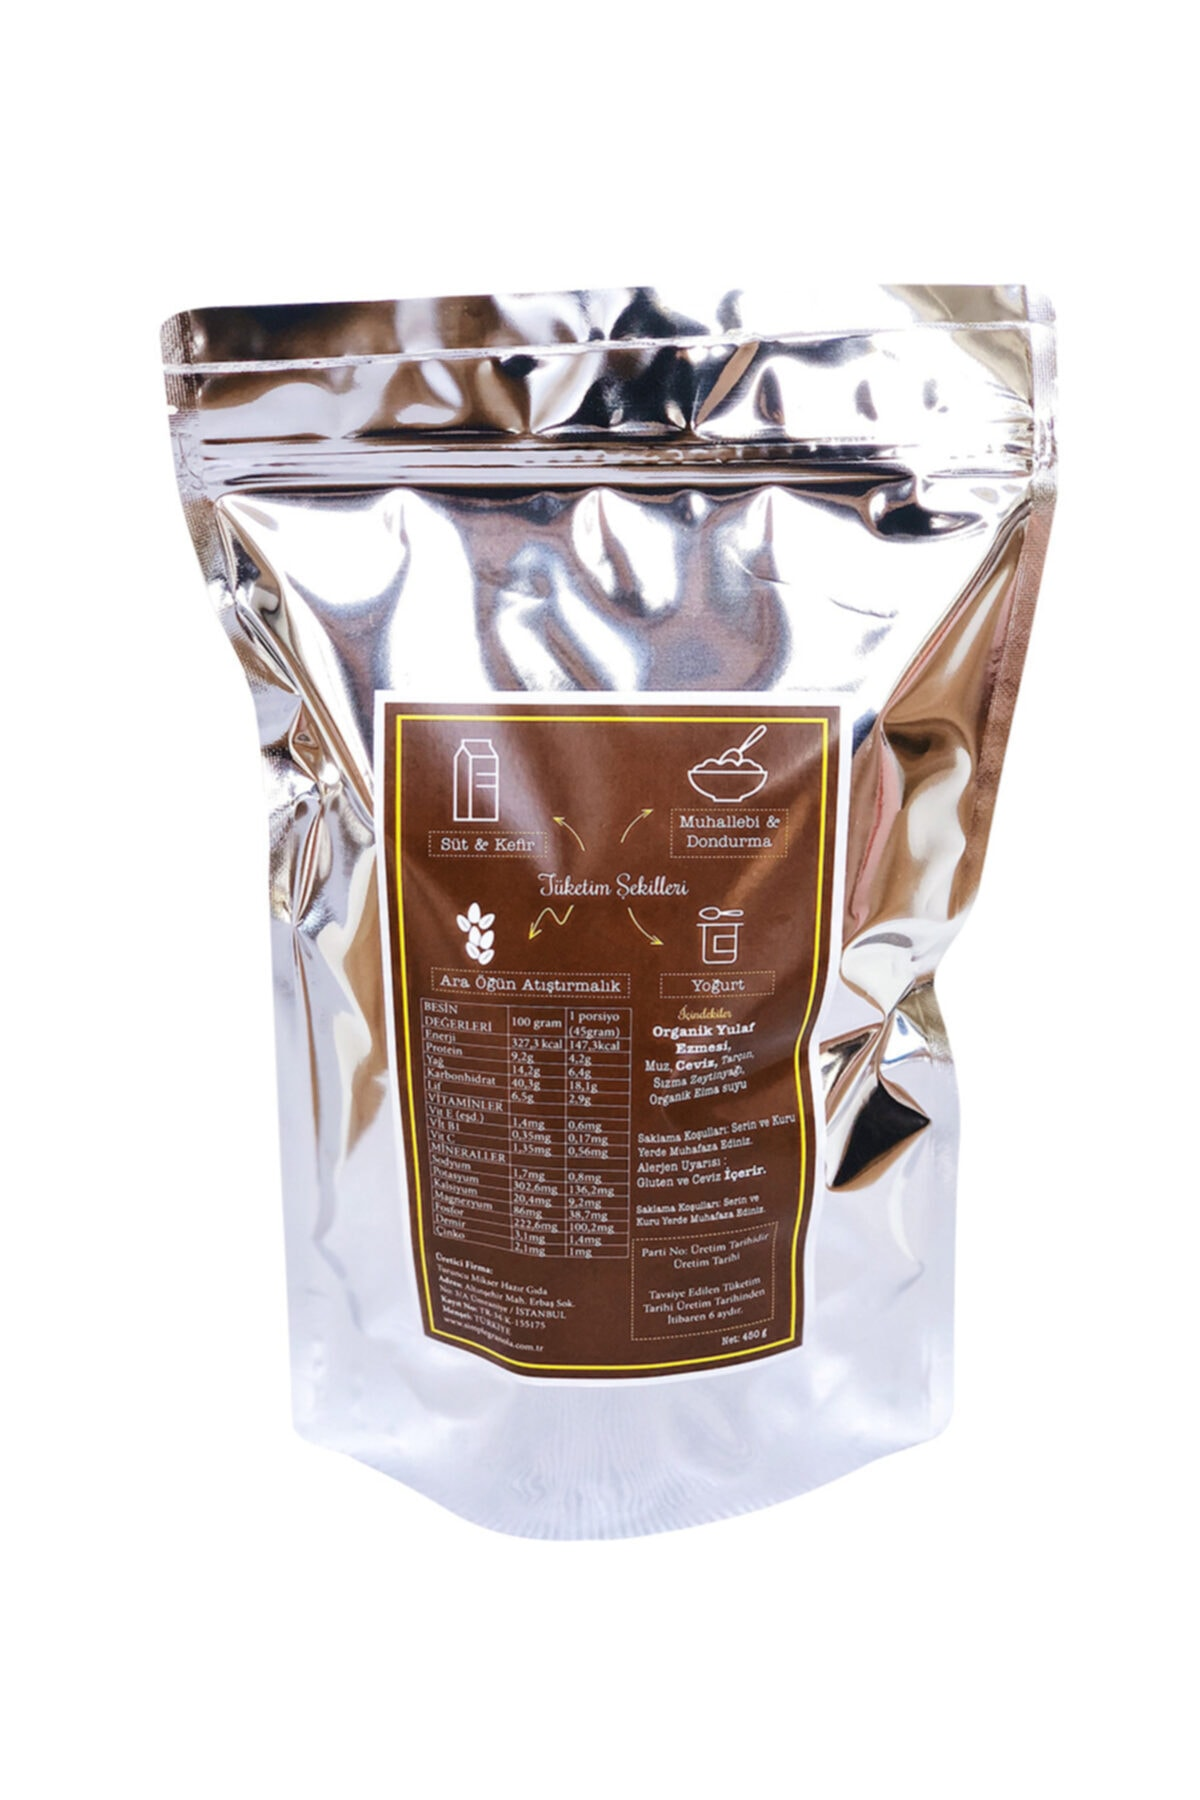 Simple Granola Muzlu Ve Cevizli Granola 450 Gram 2